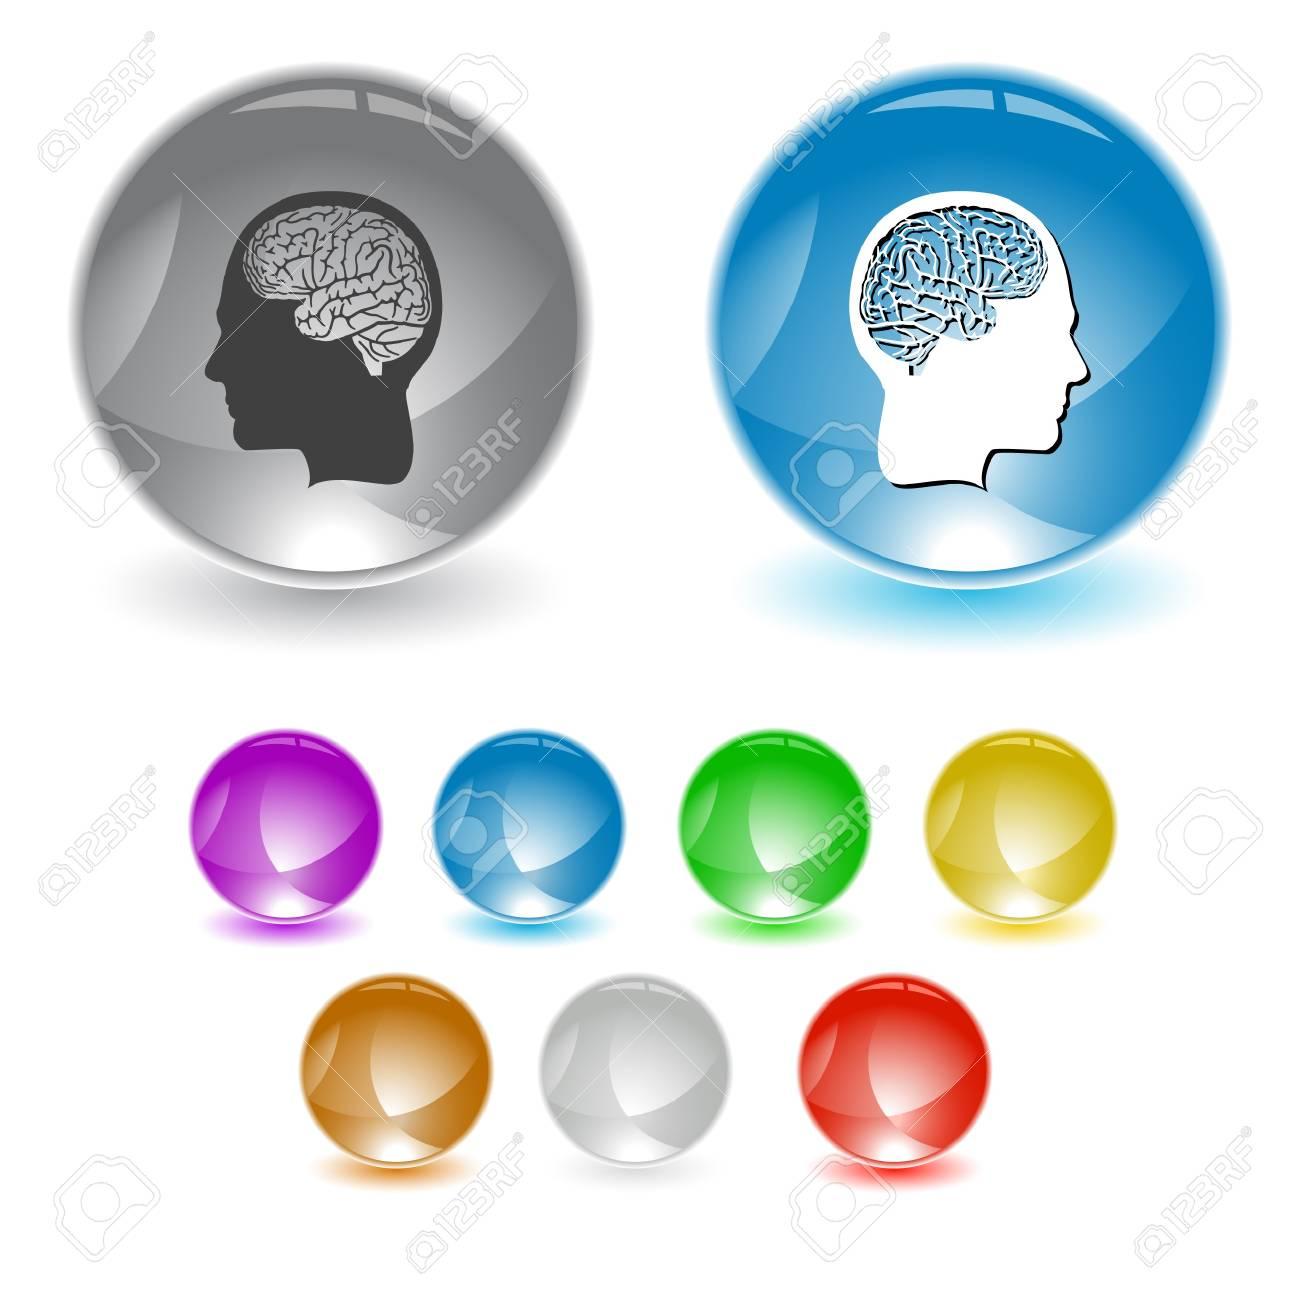 Human brain. interface element. Stock Photo - 18151727